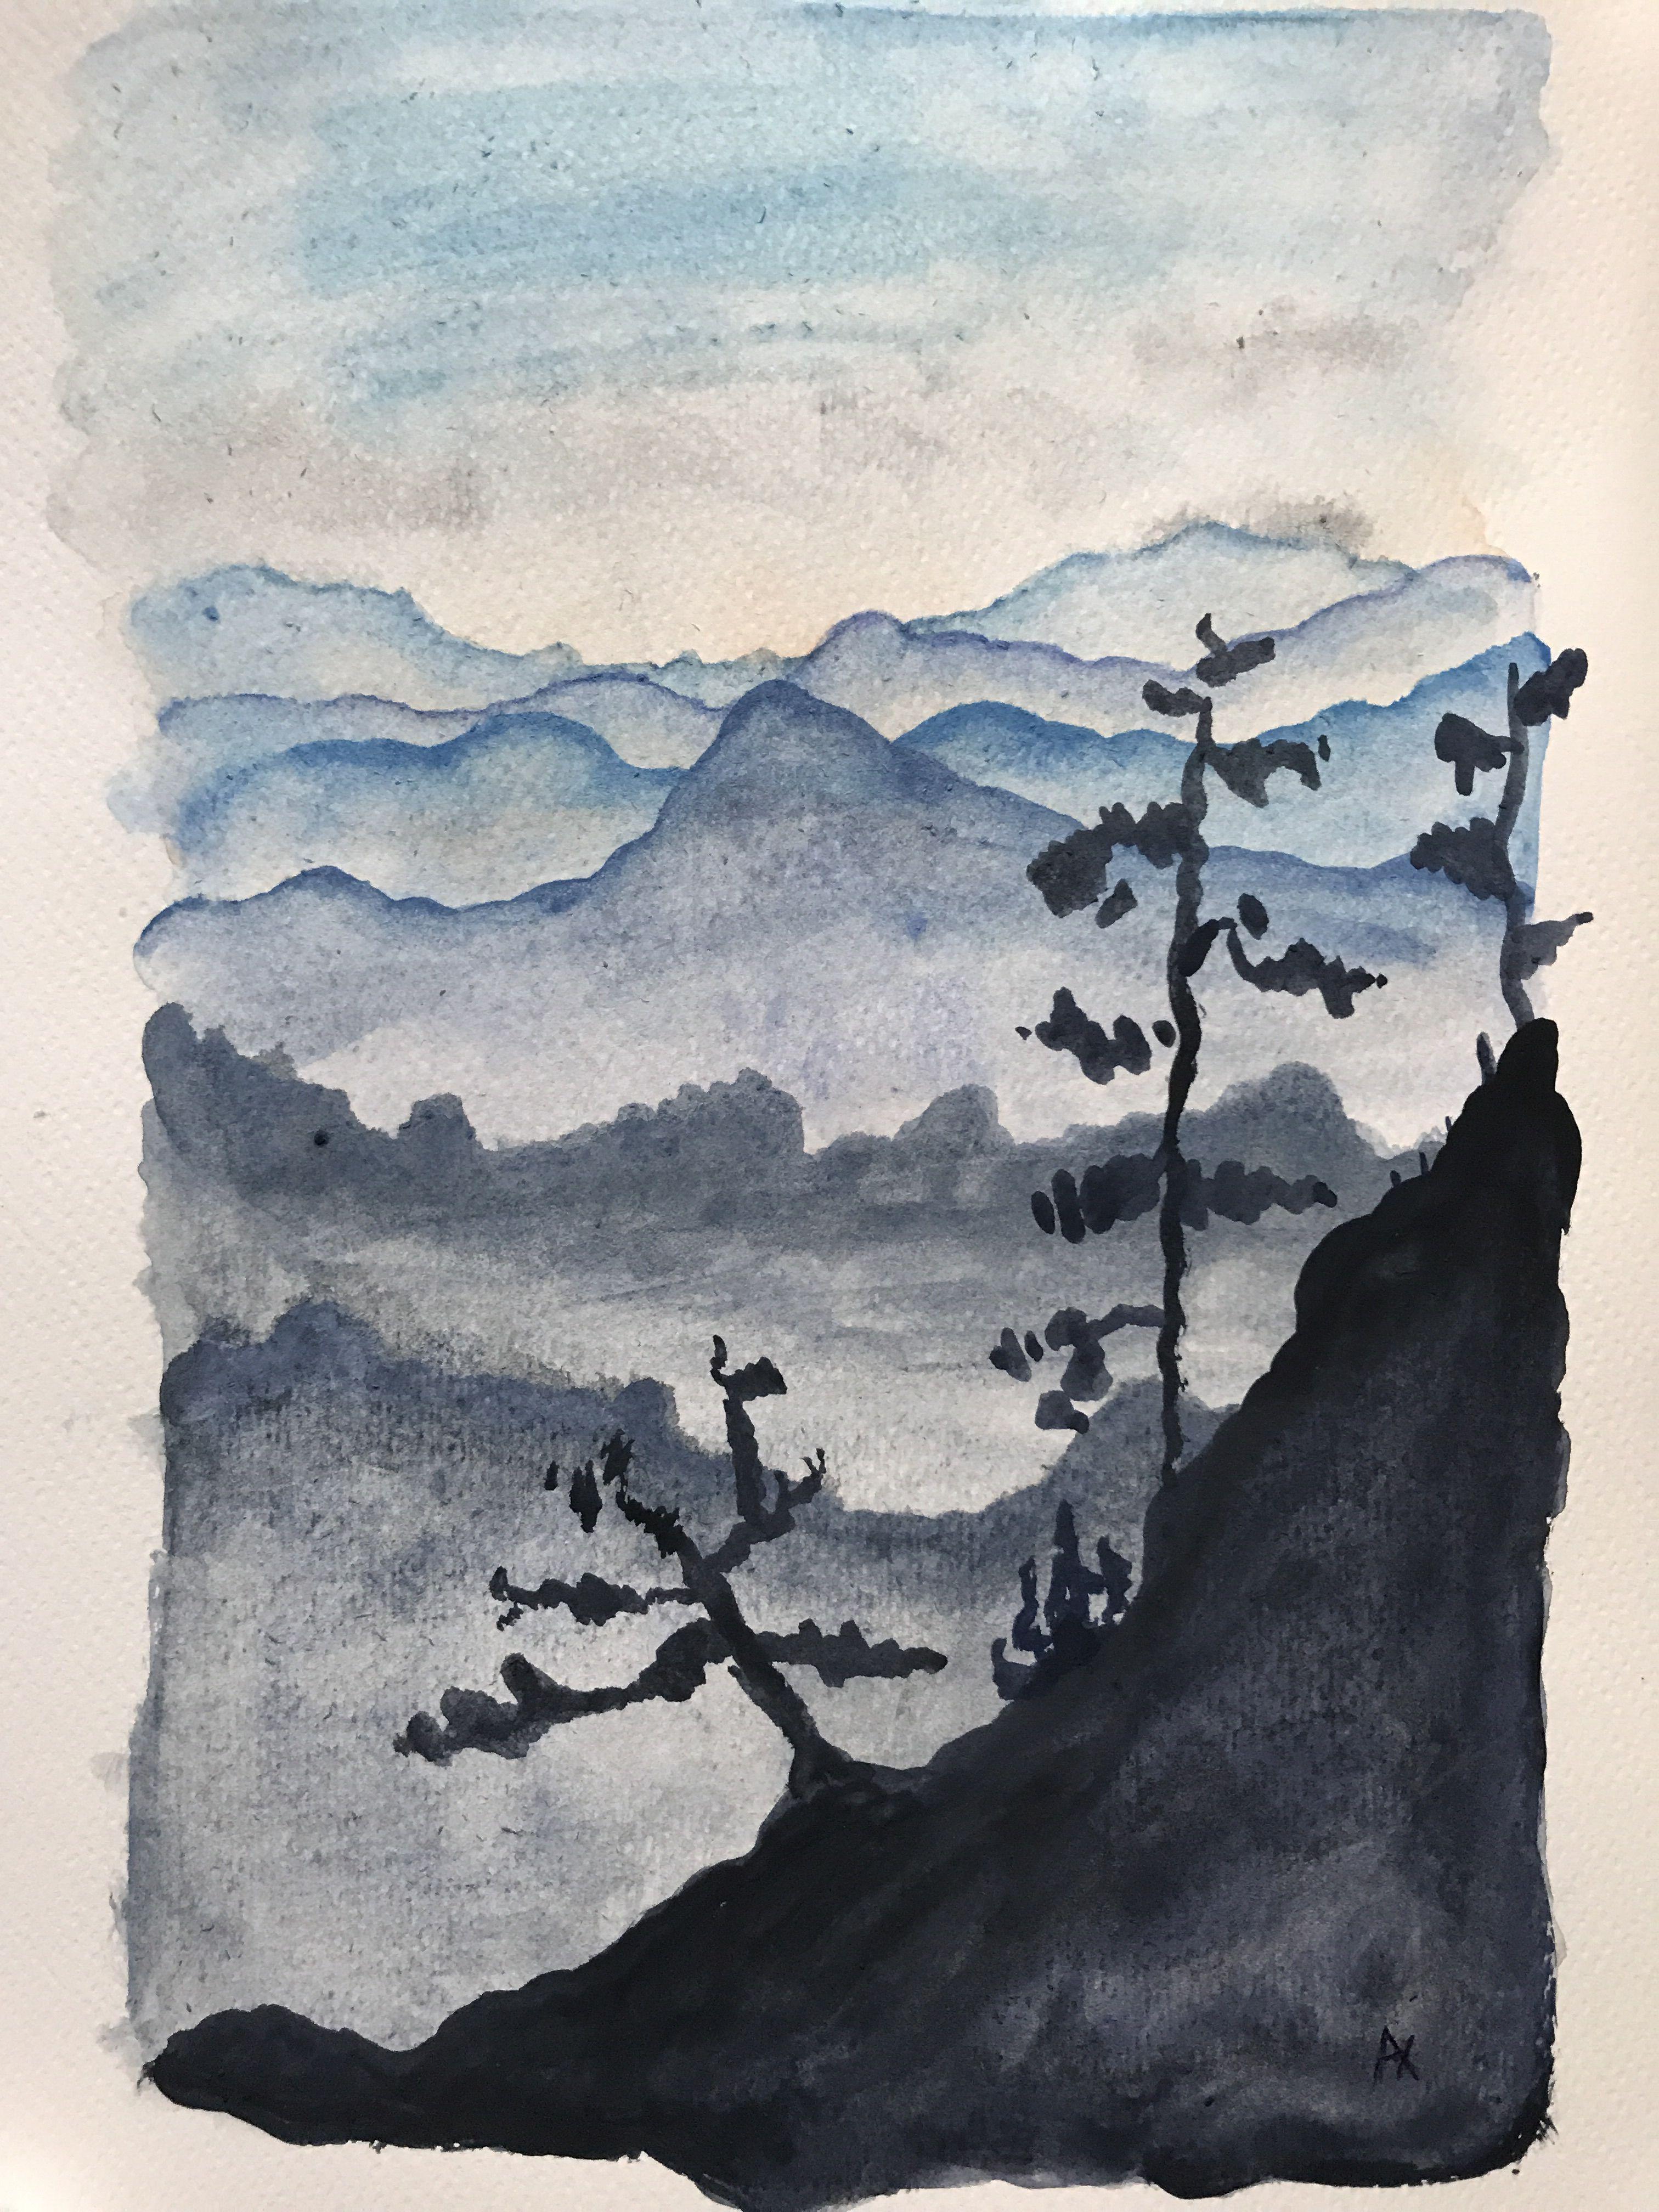 Watercolor Aquarellbilder Natur Zeichnen Aquarell